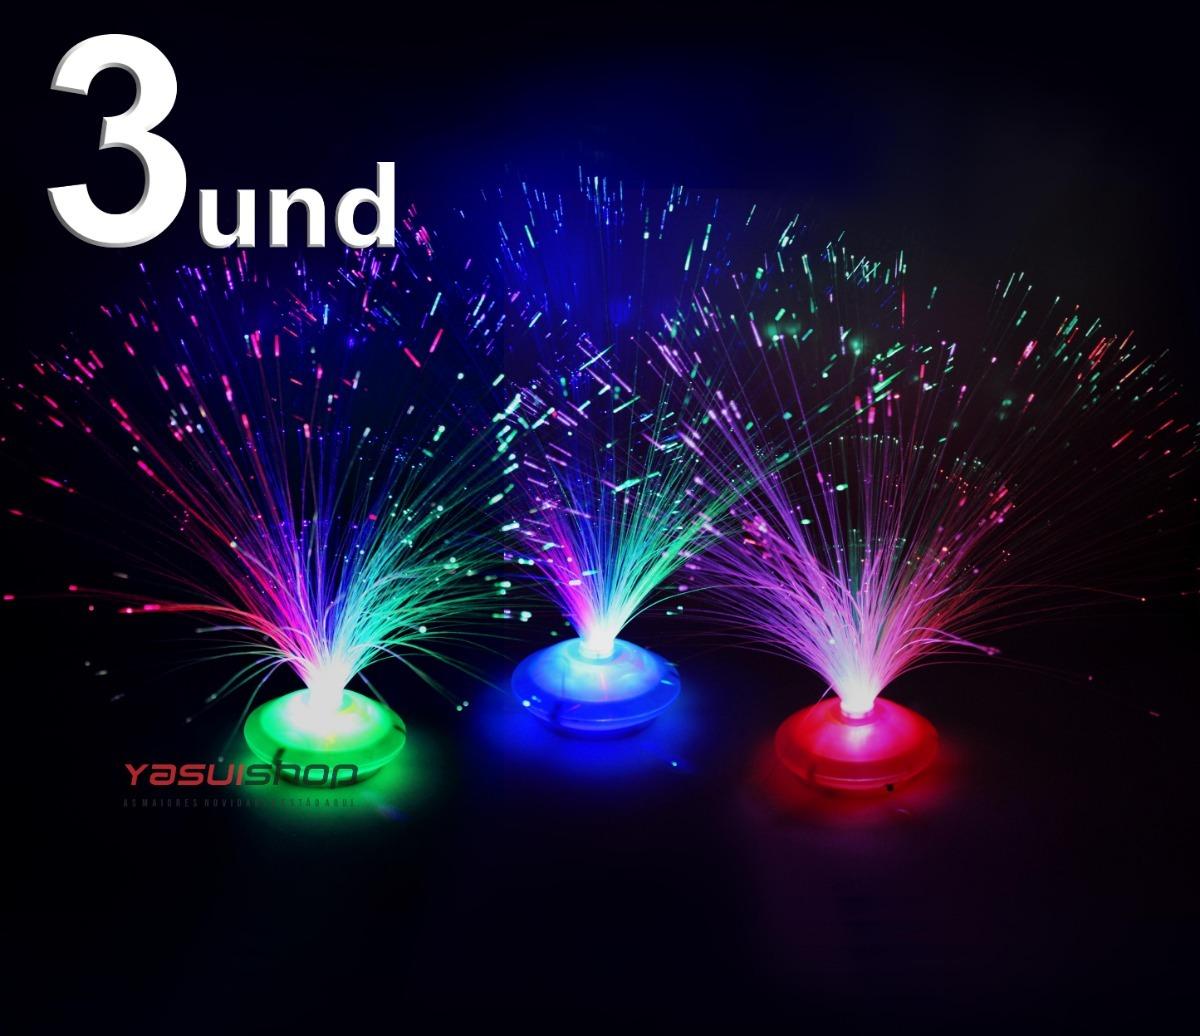 bf80064387952 abajur luz fibra optica luminarias de mesa enfeite decoracao. Carregando  zoom.